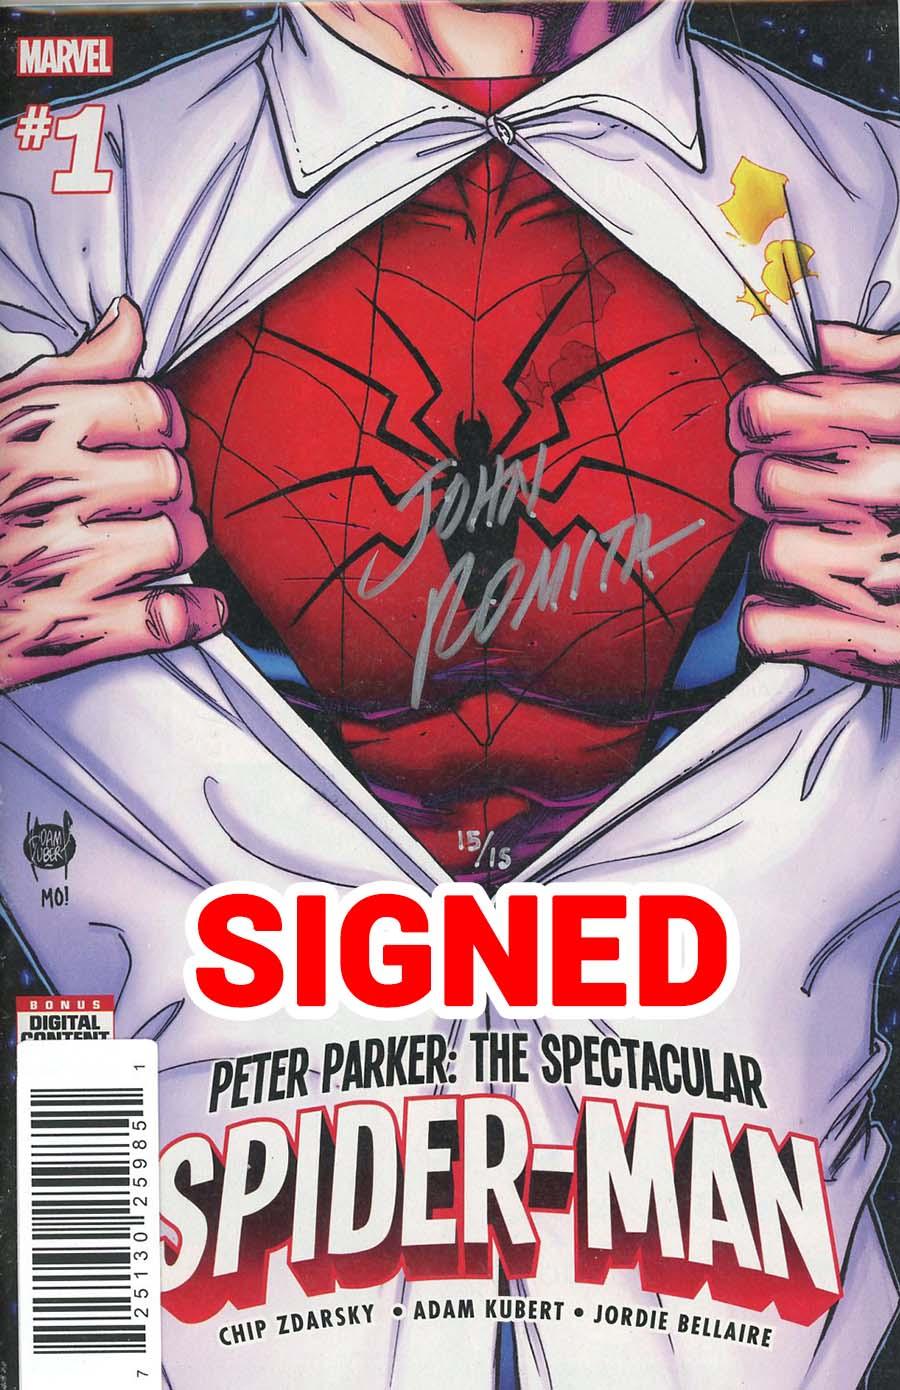 Peter Parker Spectacular Spider-Man #1 Cover L DF Signed By John Romita Sr